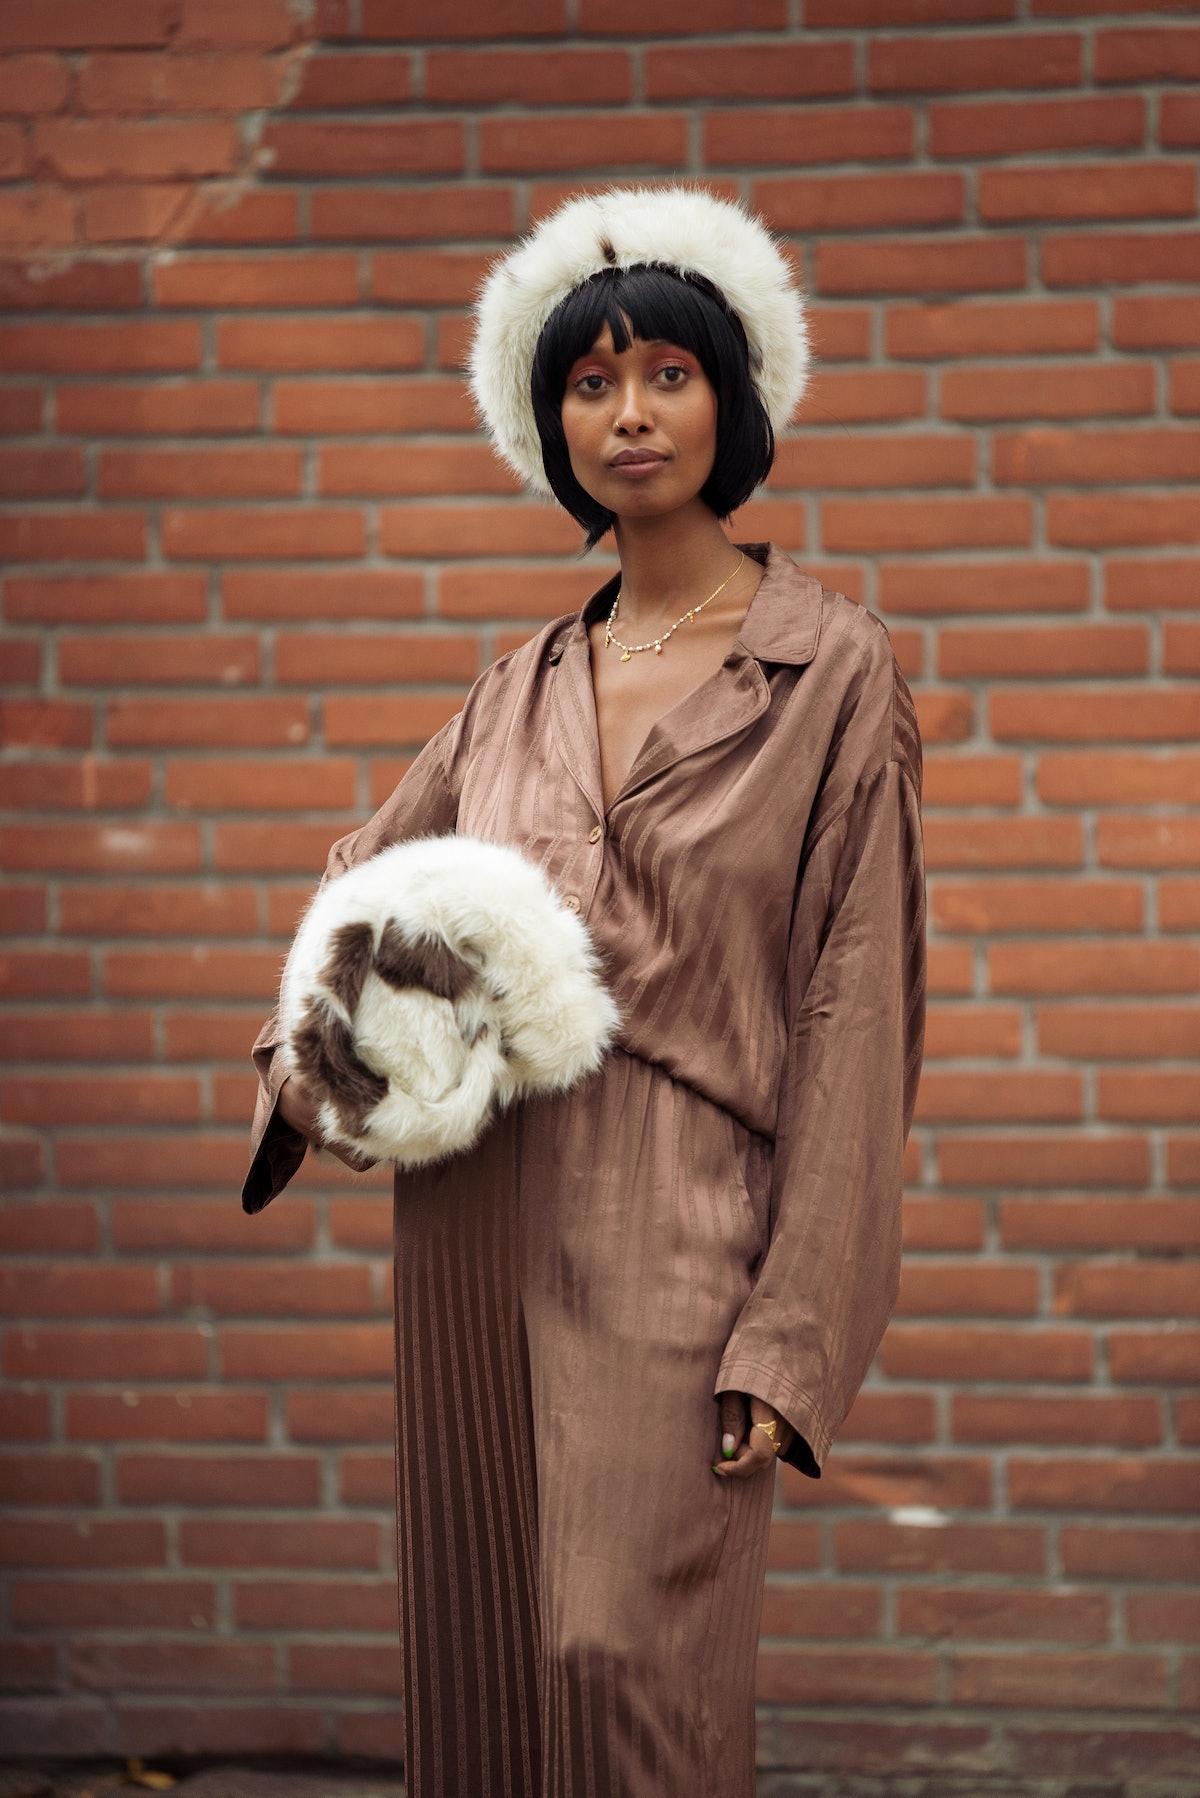 COPENHAGEN, DENMARK - AUGUST 10: Mona M. Ali wearing brown silk suit, fur har and fur bag outside Ge...